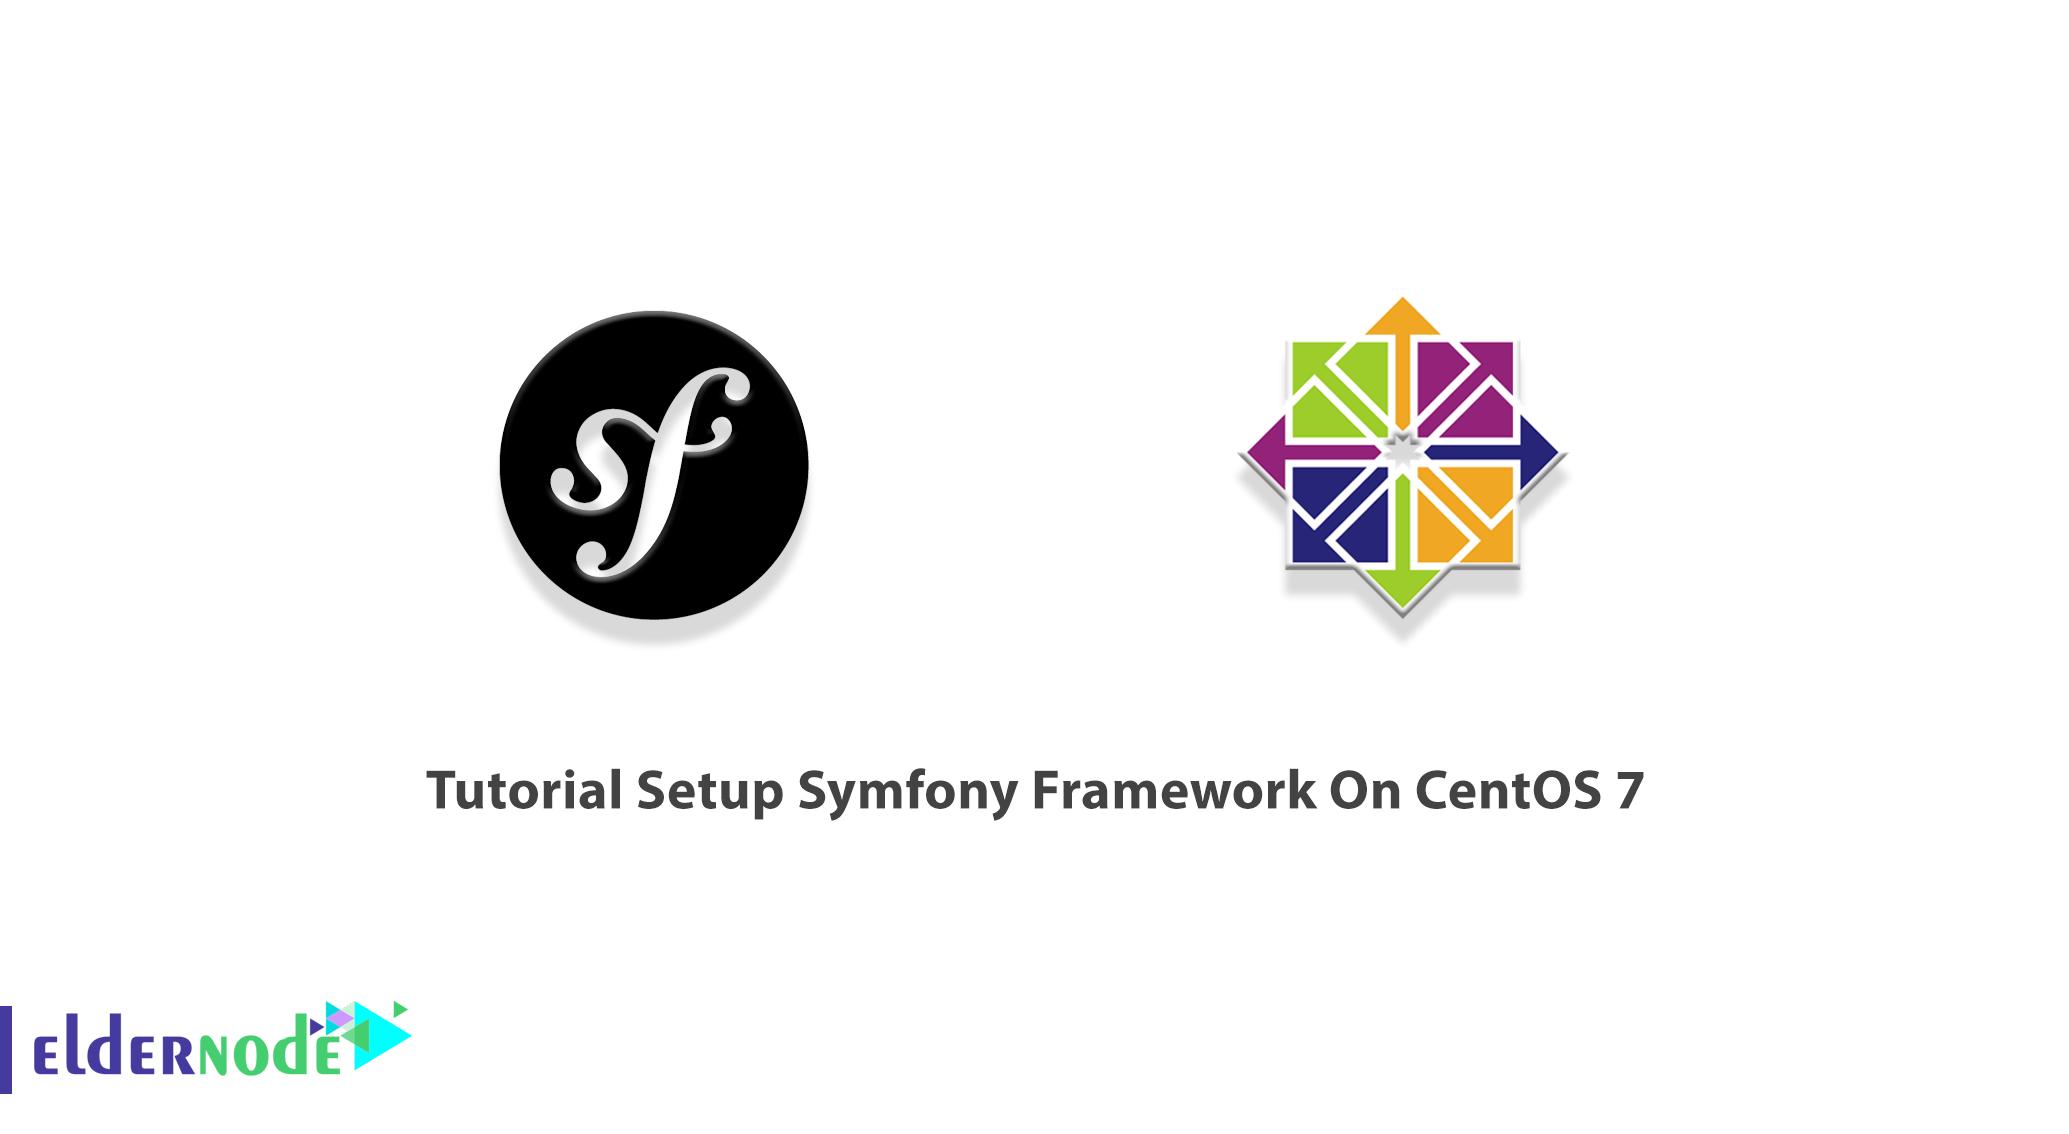 Tutorial Setup Symfony Framework On CentOS 7